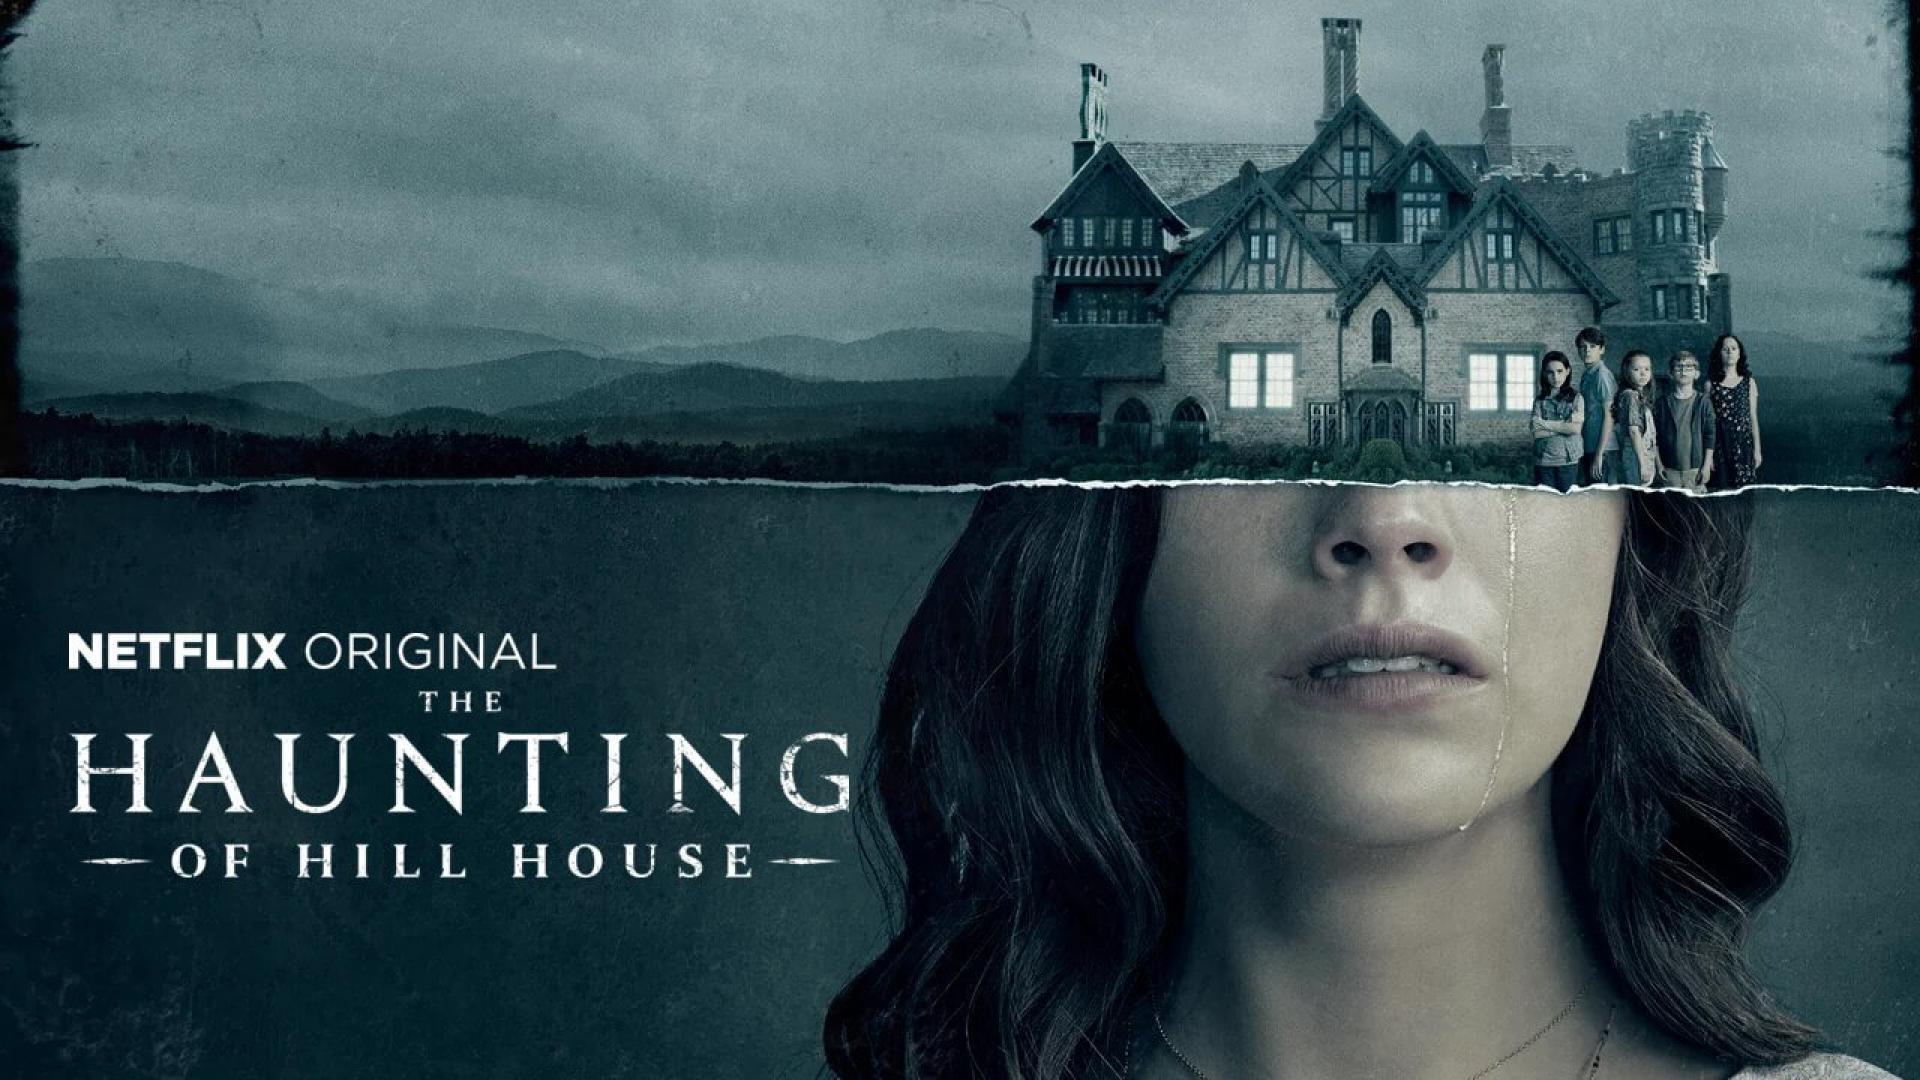 The Haunting of  Hill House I. évad értékelője